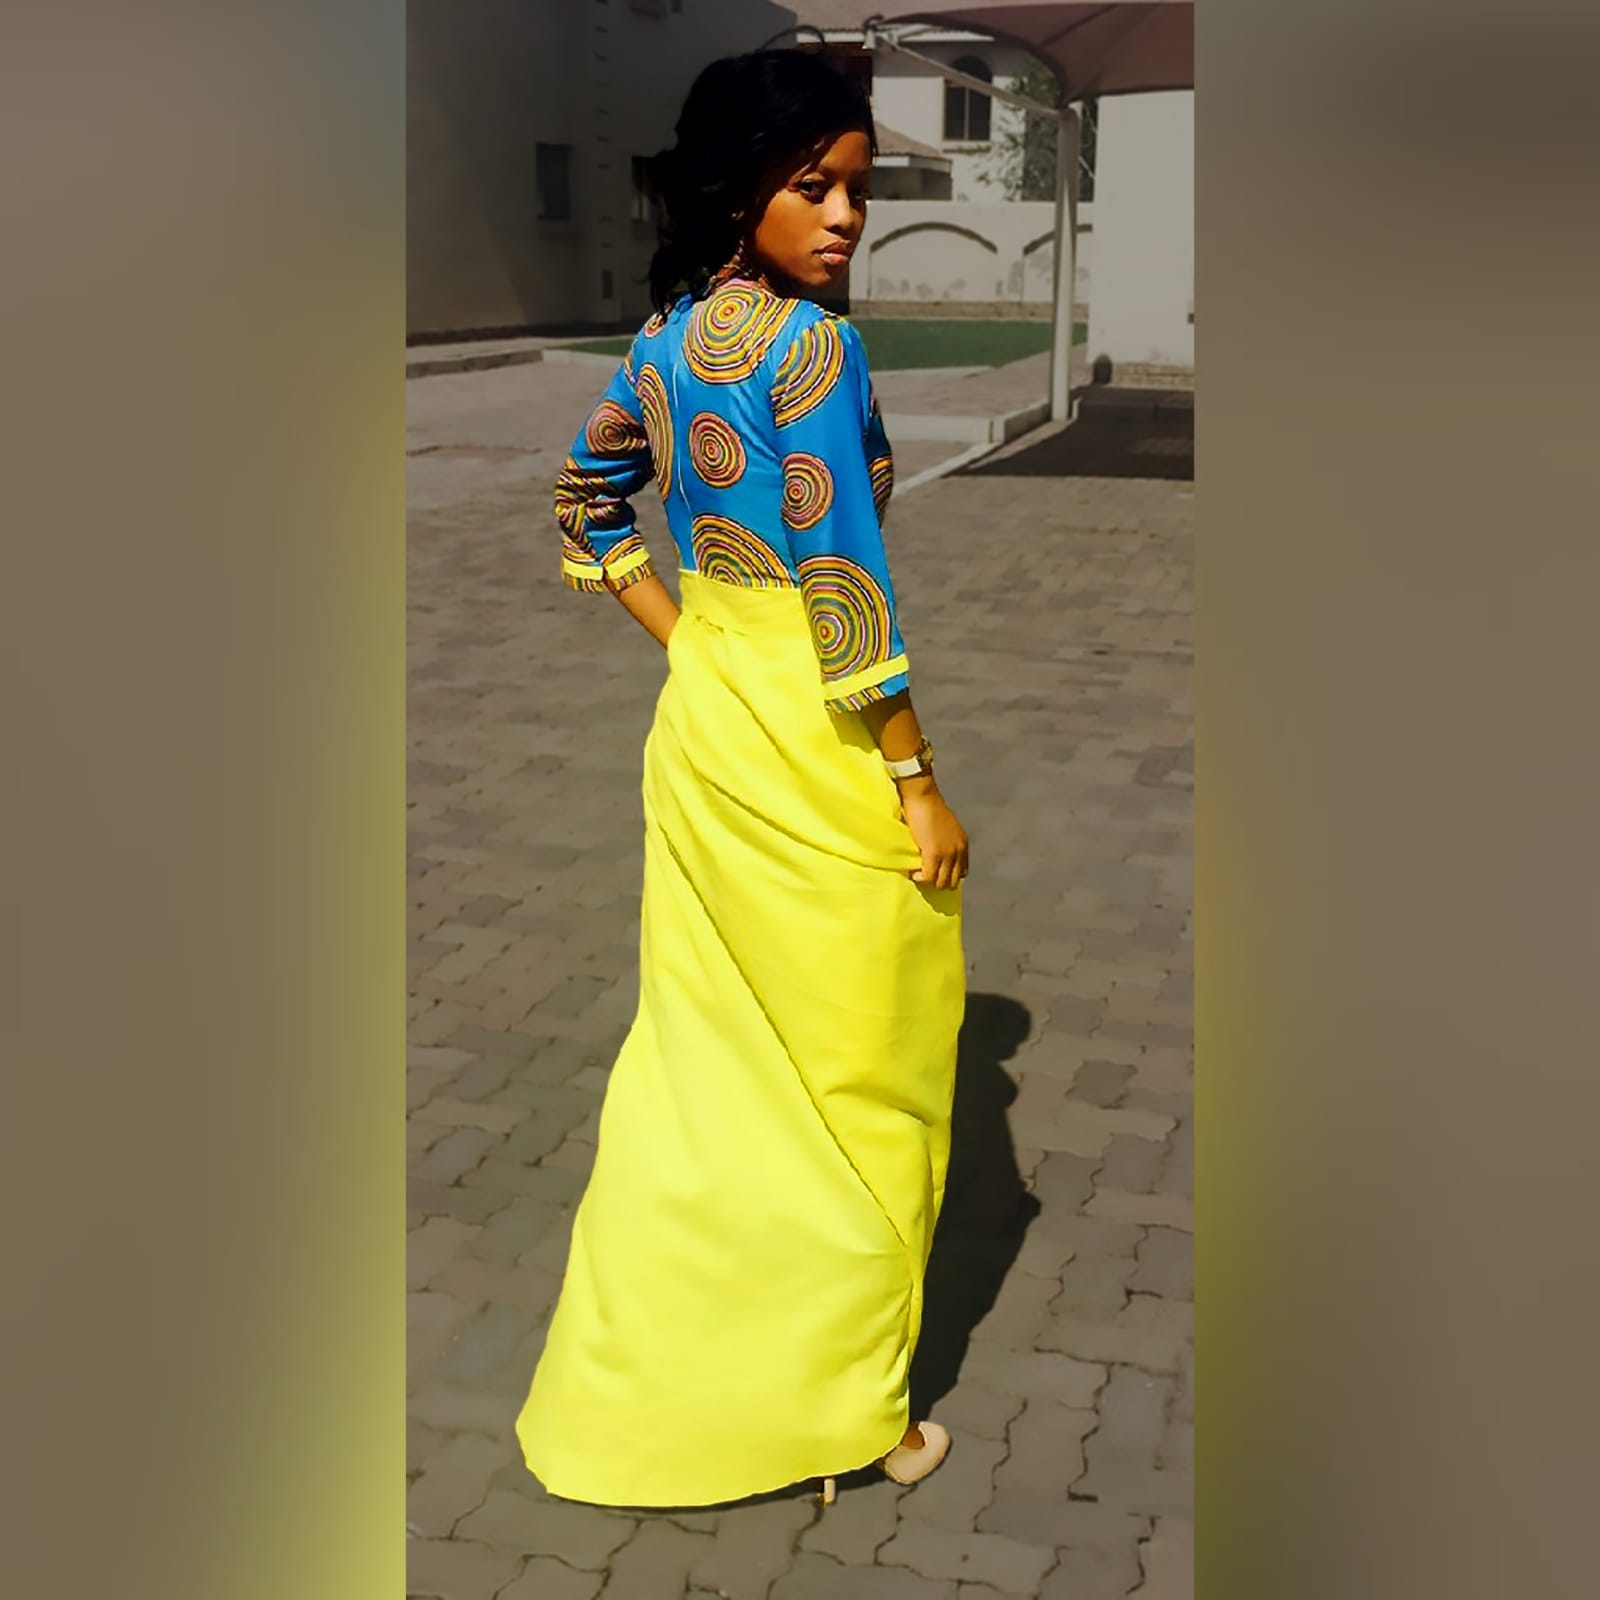 Blue & yellow modern traditional dress 4 modern traditional blue and yellow empire fit dress. Flowy bottom, neckline with a slit.